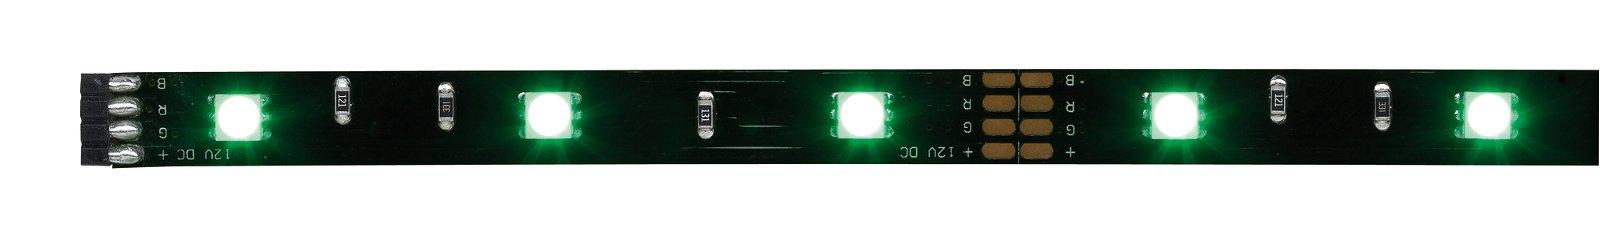 YourLED ECO LED Strip RGB 1m 6W 110lm/m RGB